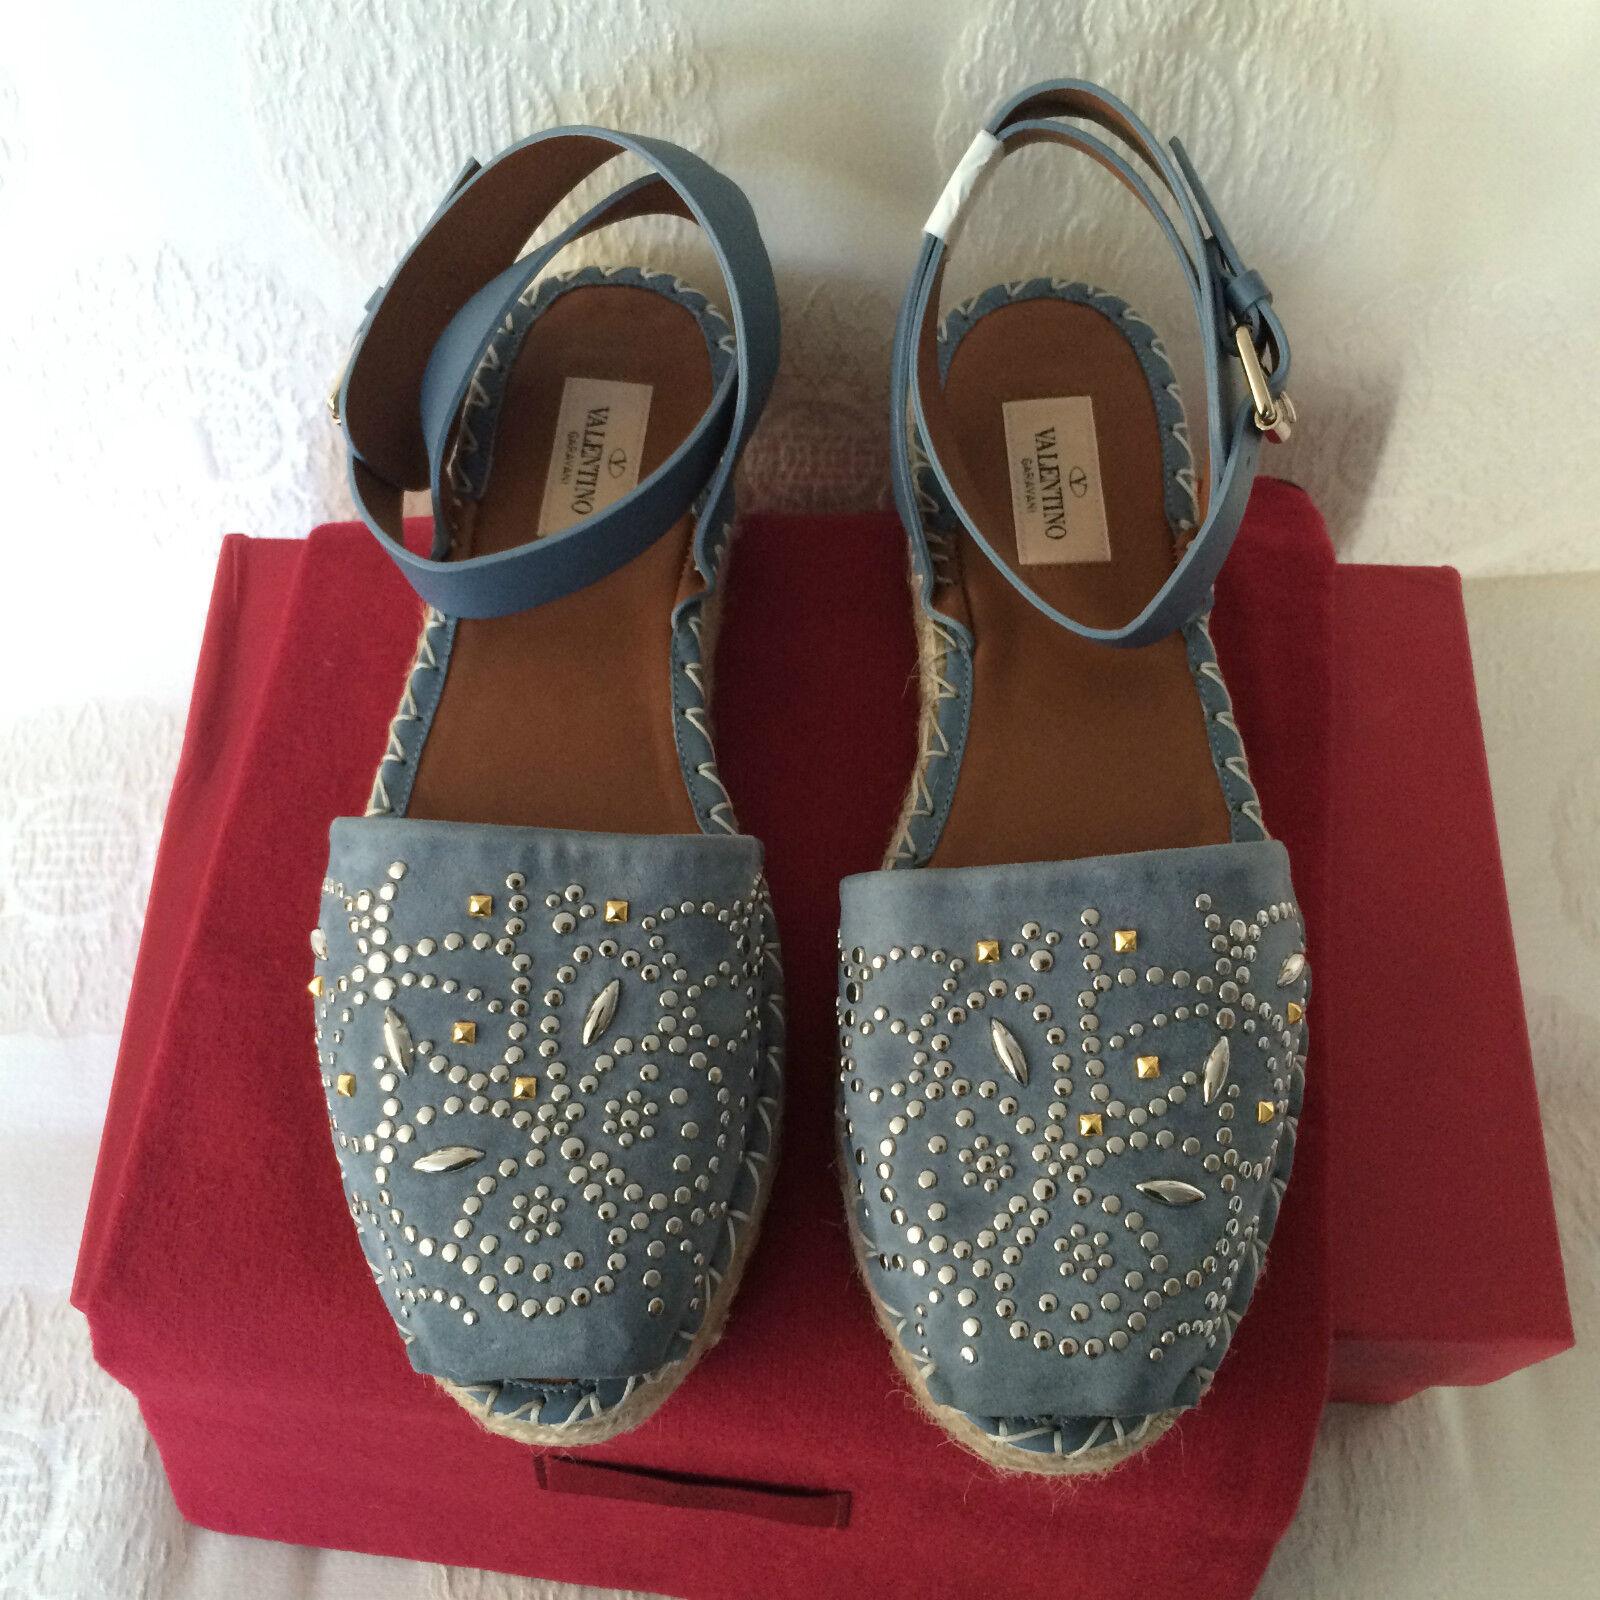 Valentino Grey Suede Peep-Toe Espadrilles NWB Dust Dust Dust Bag Size10 40 Retail  1045 b1a107